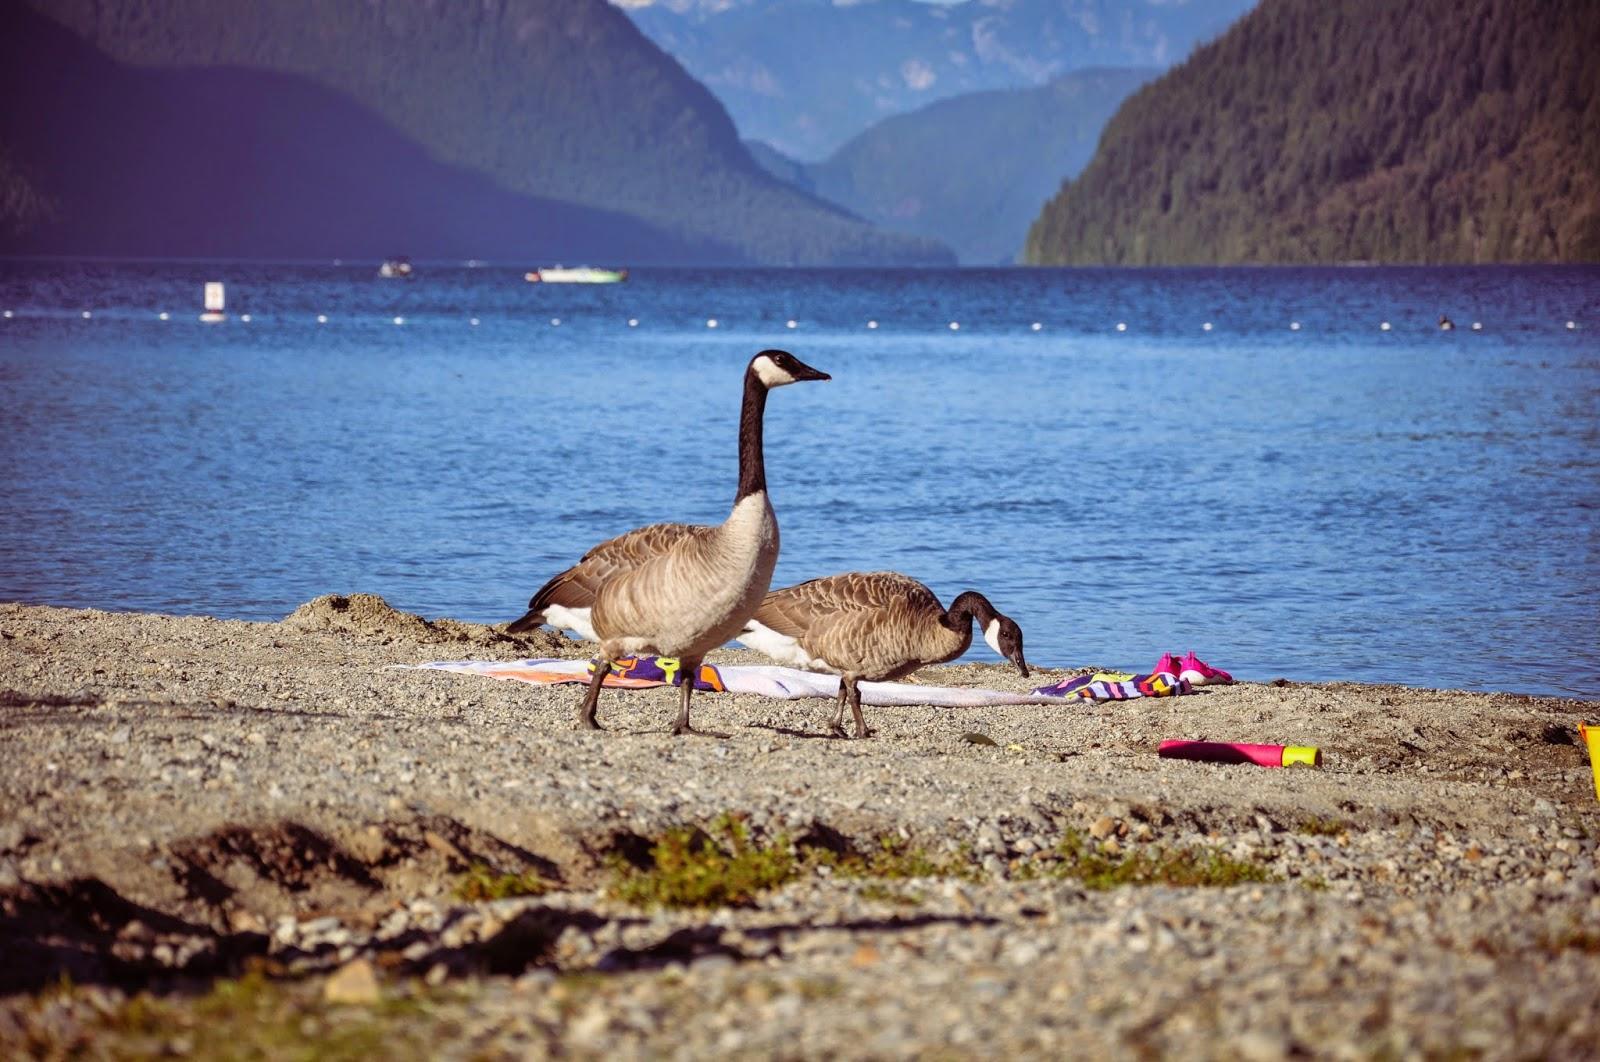 Geese \ Гуси \ Alouette Lake, BC, Canada \ Озеро Аллуэт, Канада, Британская Колумбия